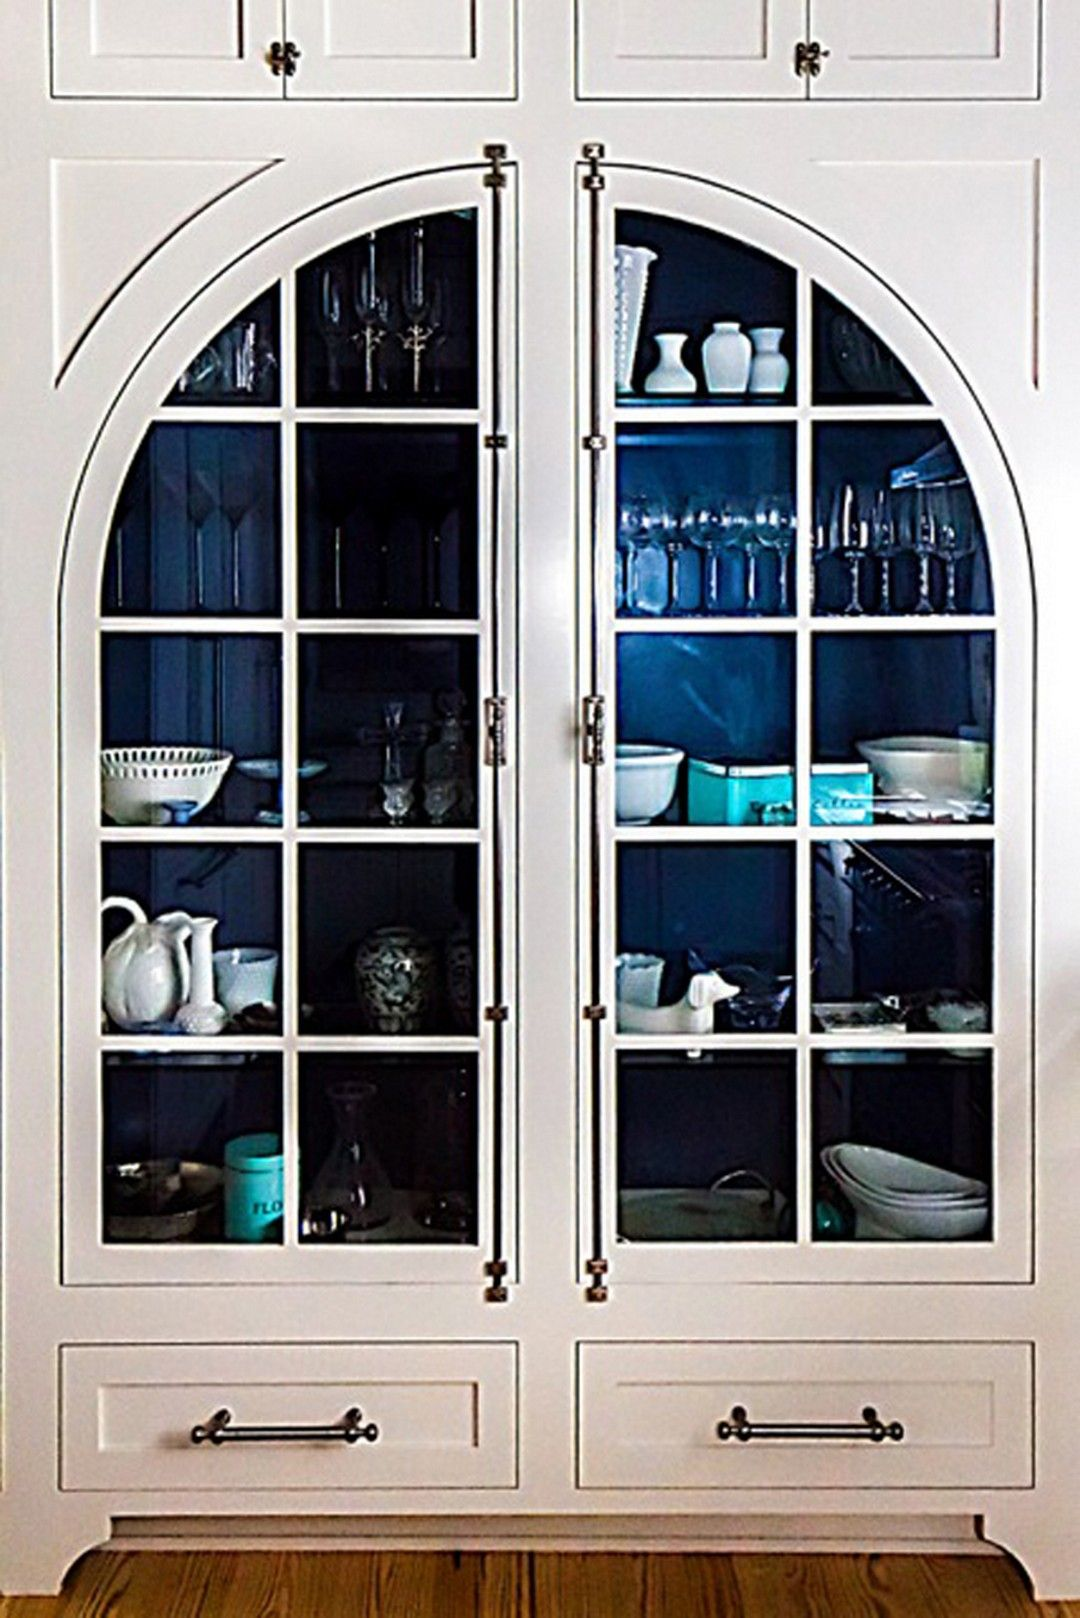 Navy Blue Interior Doors 27 Inspirational Photos Https Www Onechitecture Com 2017 10 17 Navy Blue Int Blue Interior Doors Bungalow Renovation Doors Interior